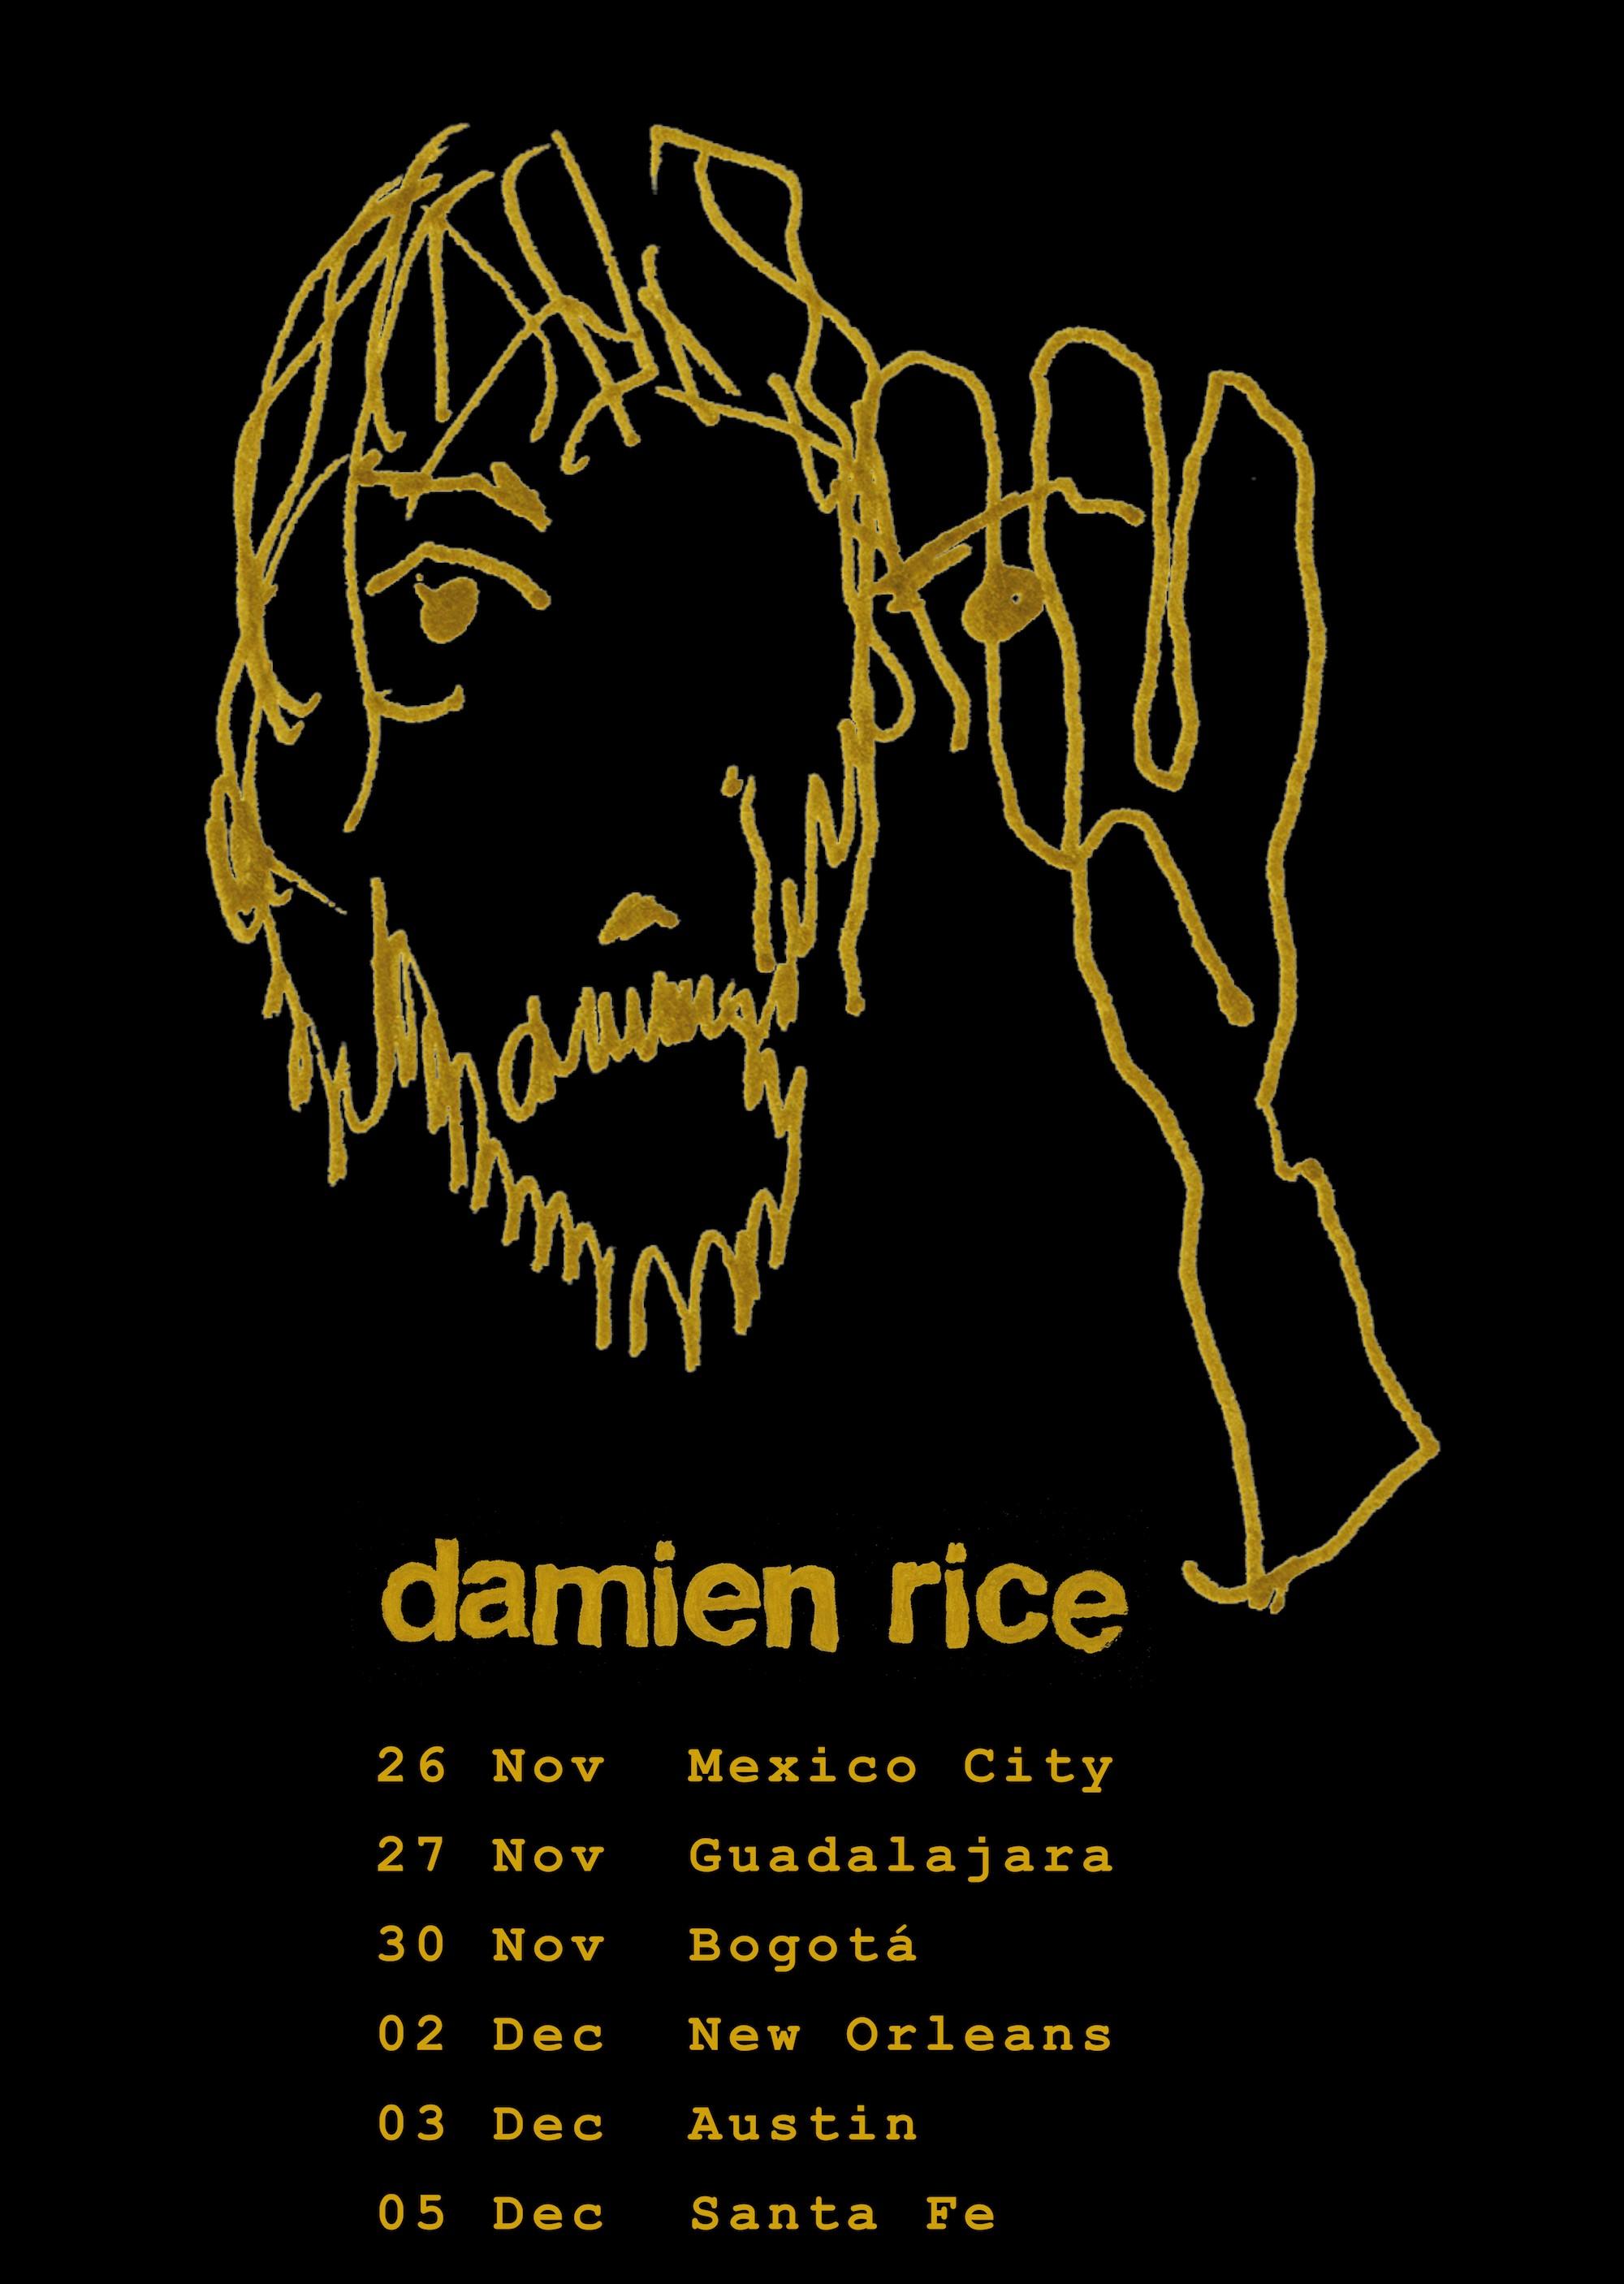 Kalender 2019 Pdf Lengkap Más Actual Damien Rice Ficial Website Music tour News Munity